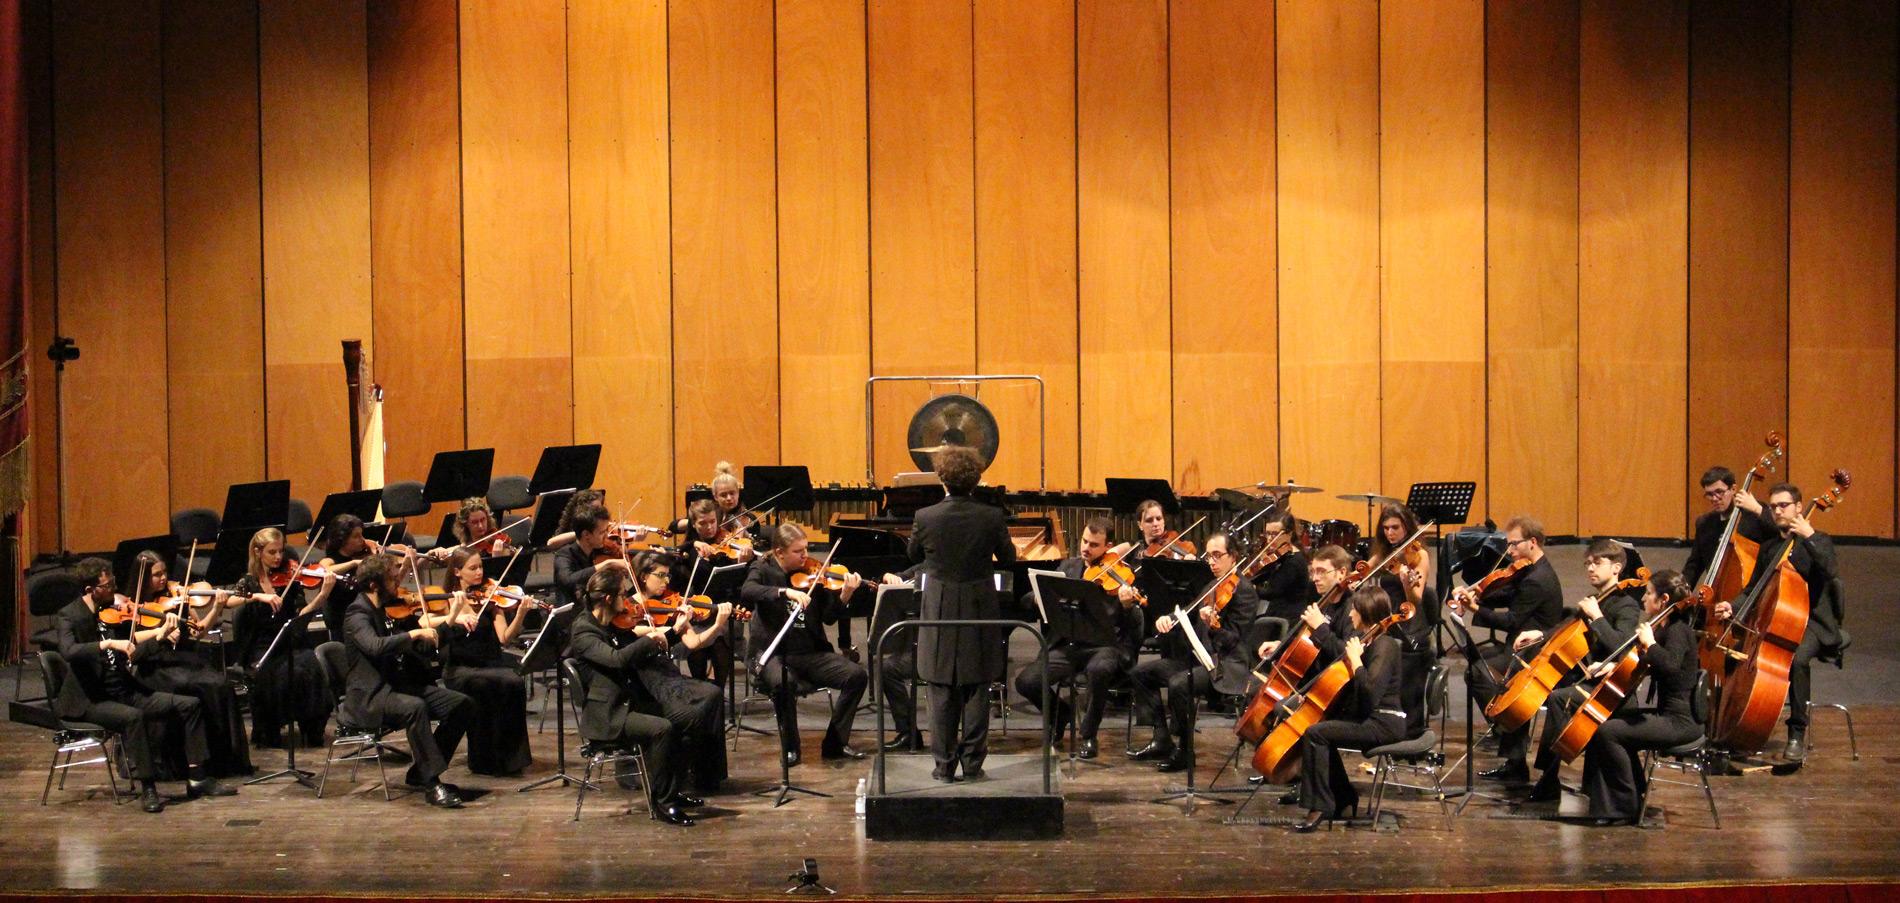 Orchestra Machiavelli al Teatro Filarmonico